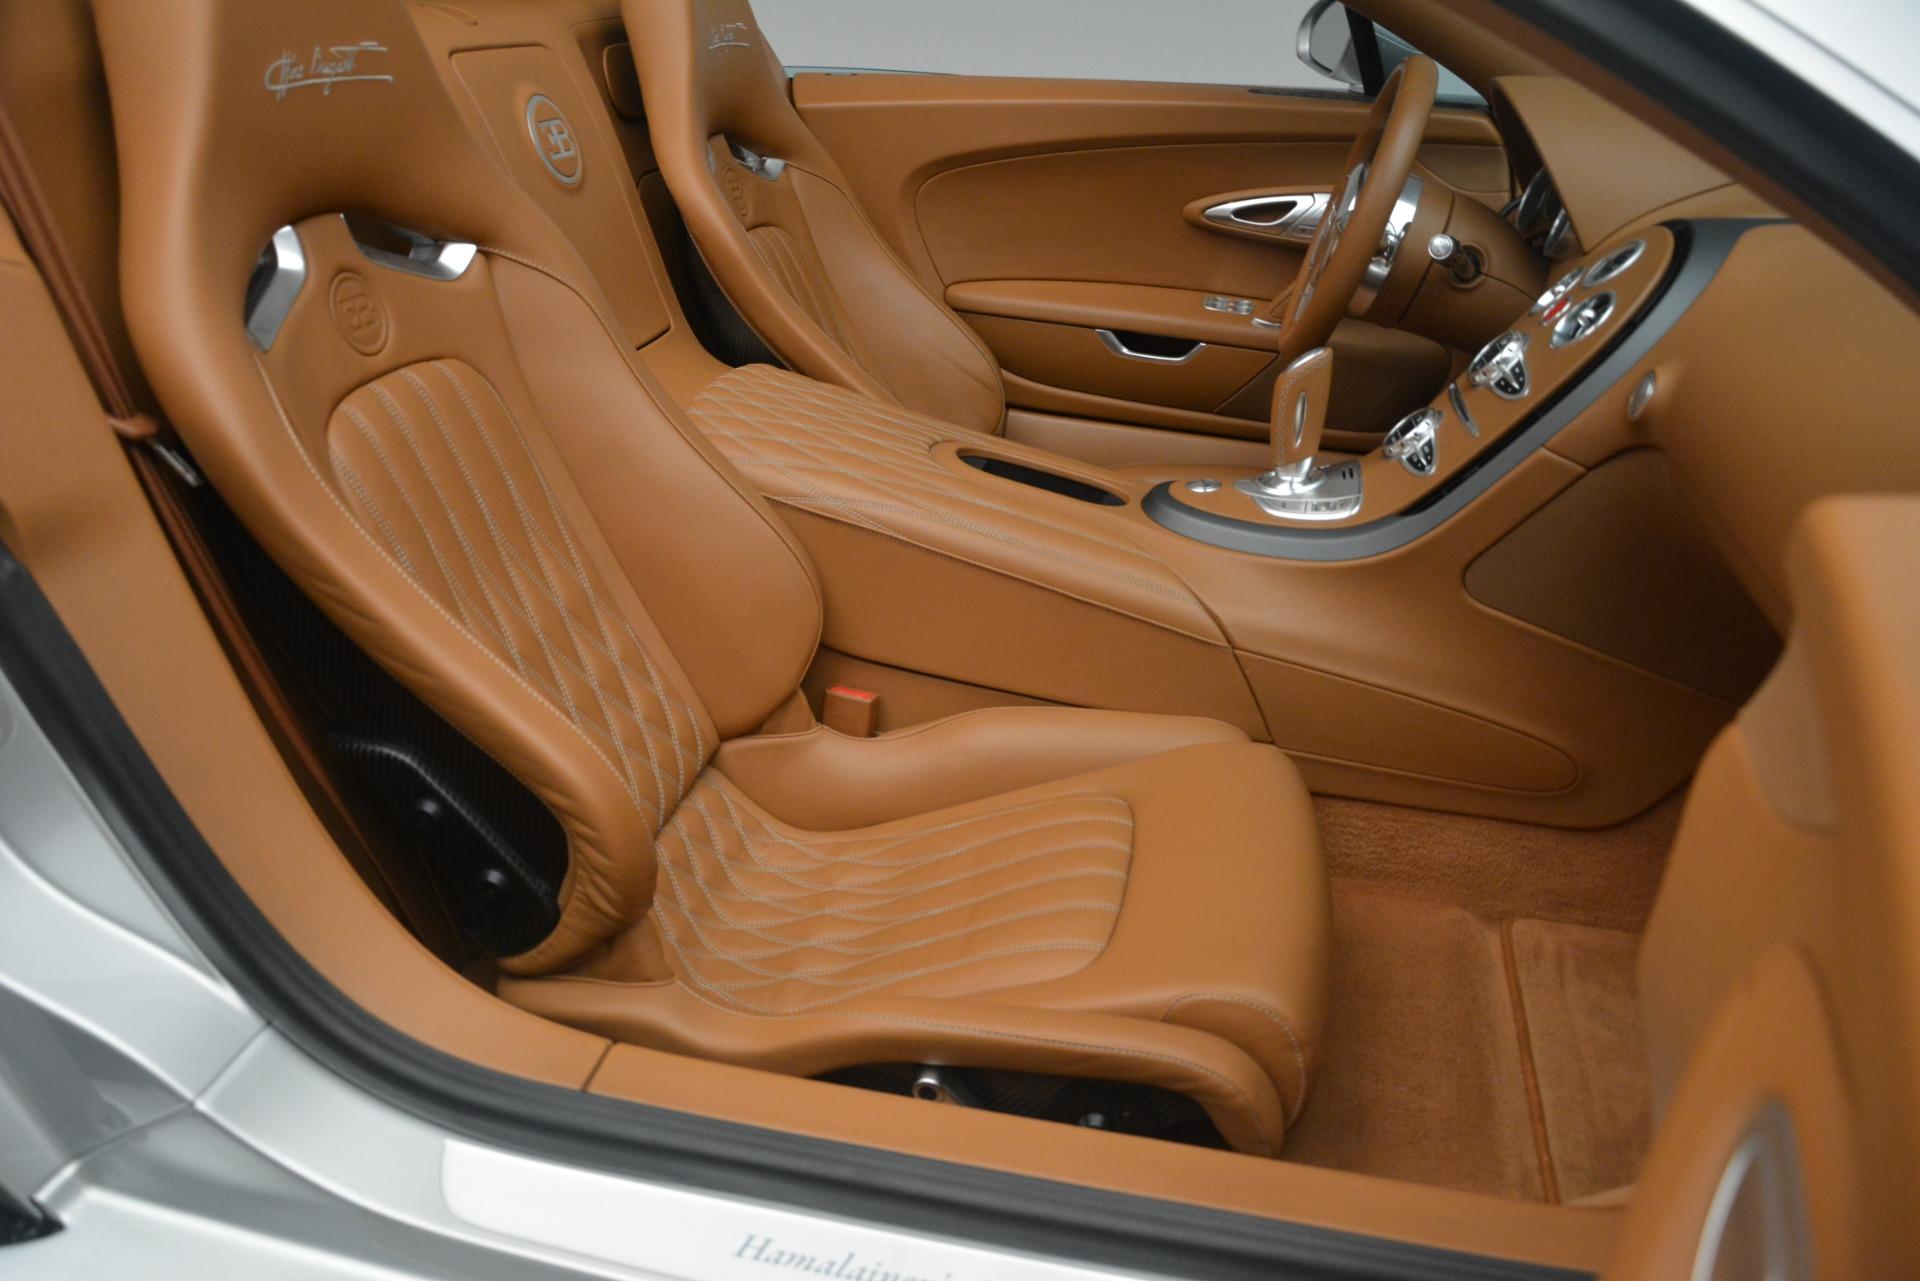 Used 2010 Bugatti Veyron 16.4 Grand Sport For Sale In Greenwich, CT 3159_p35